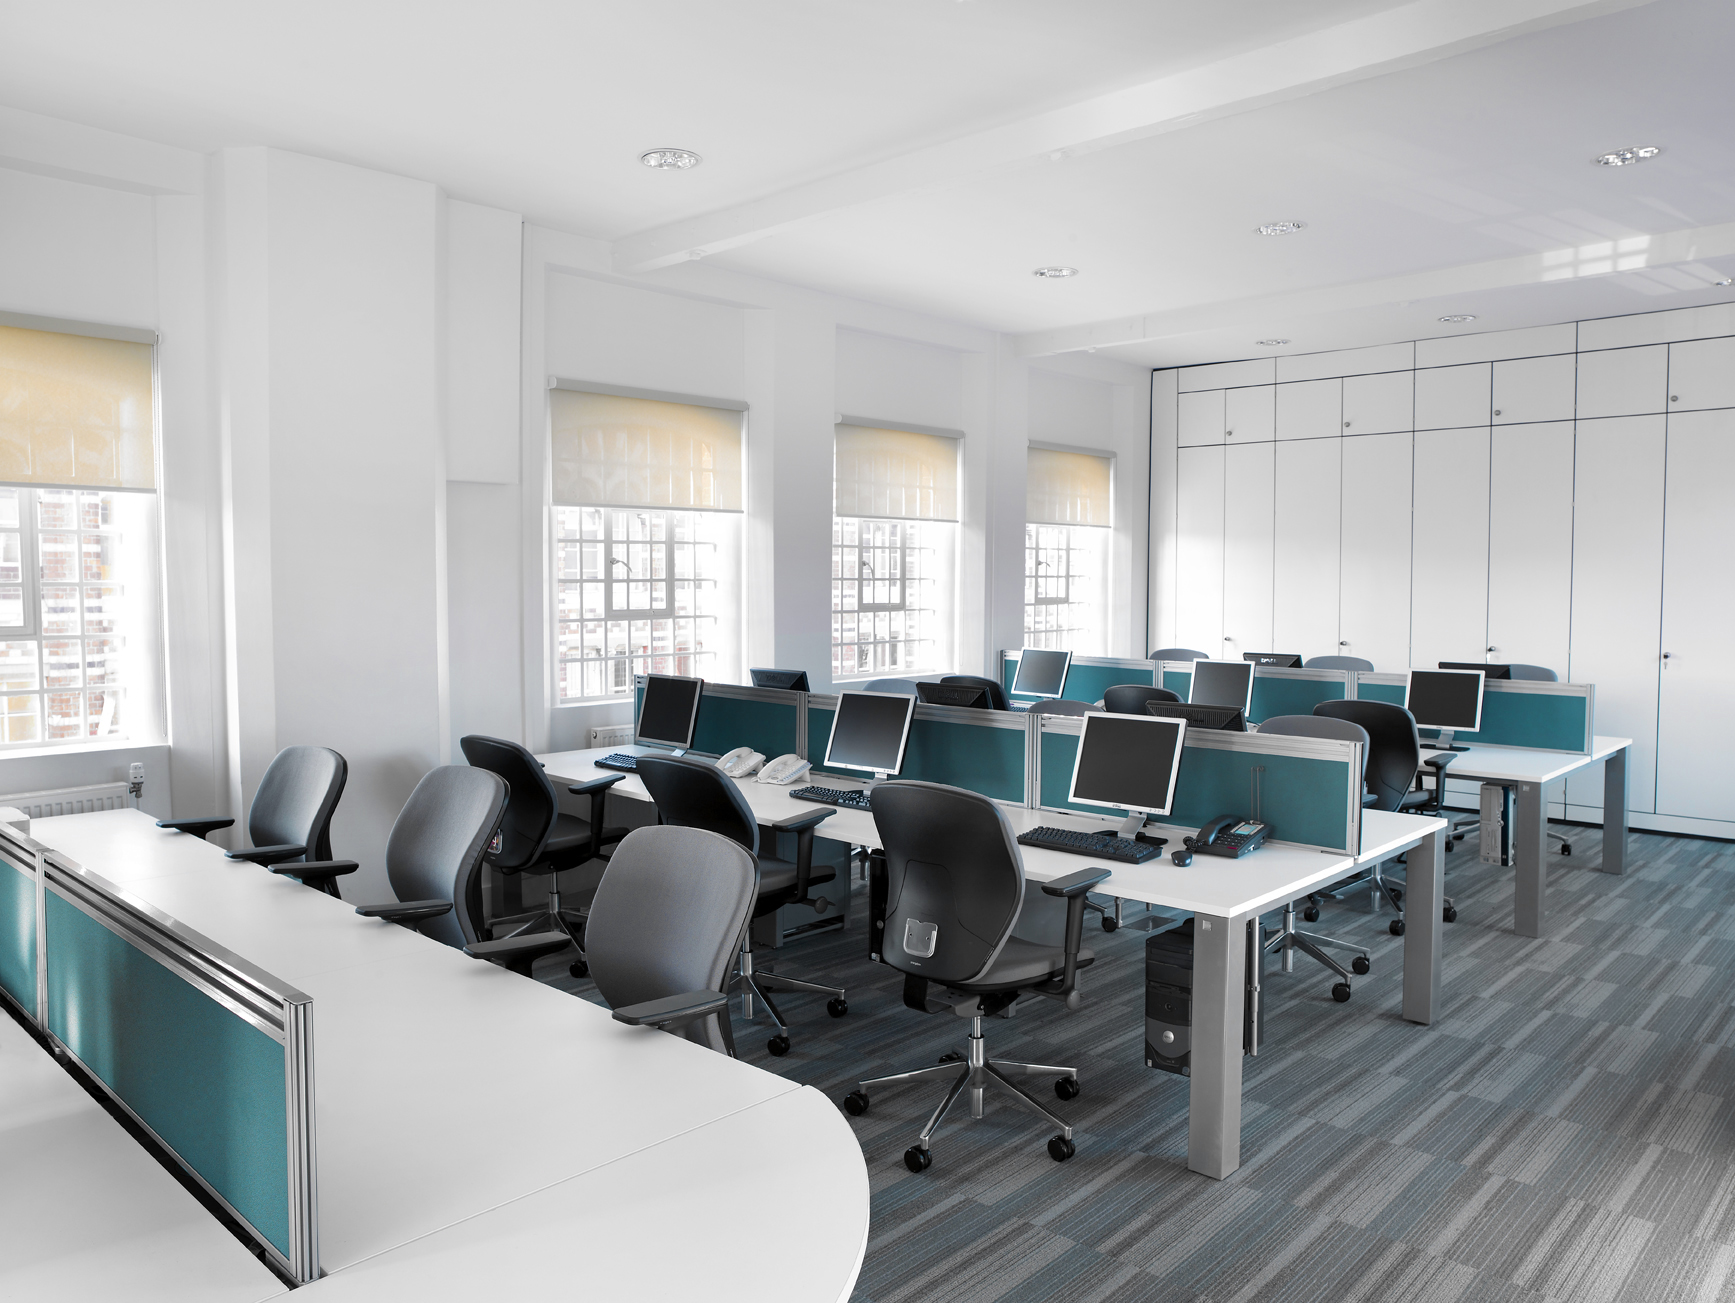 Office 3 cw